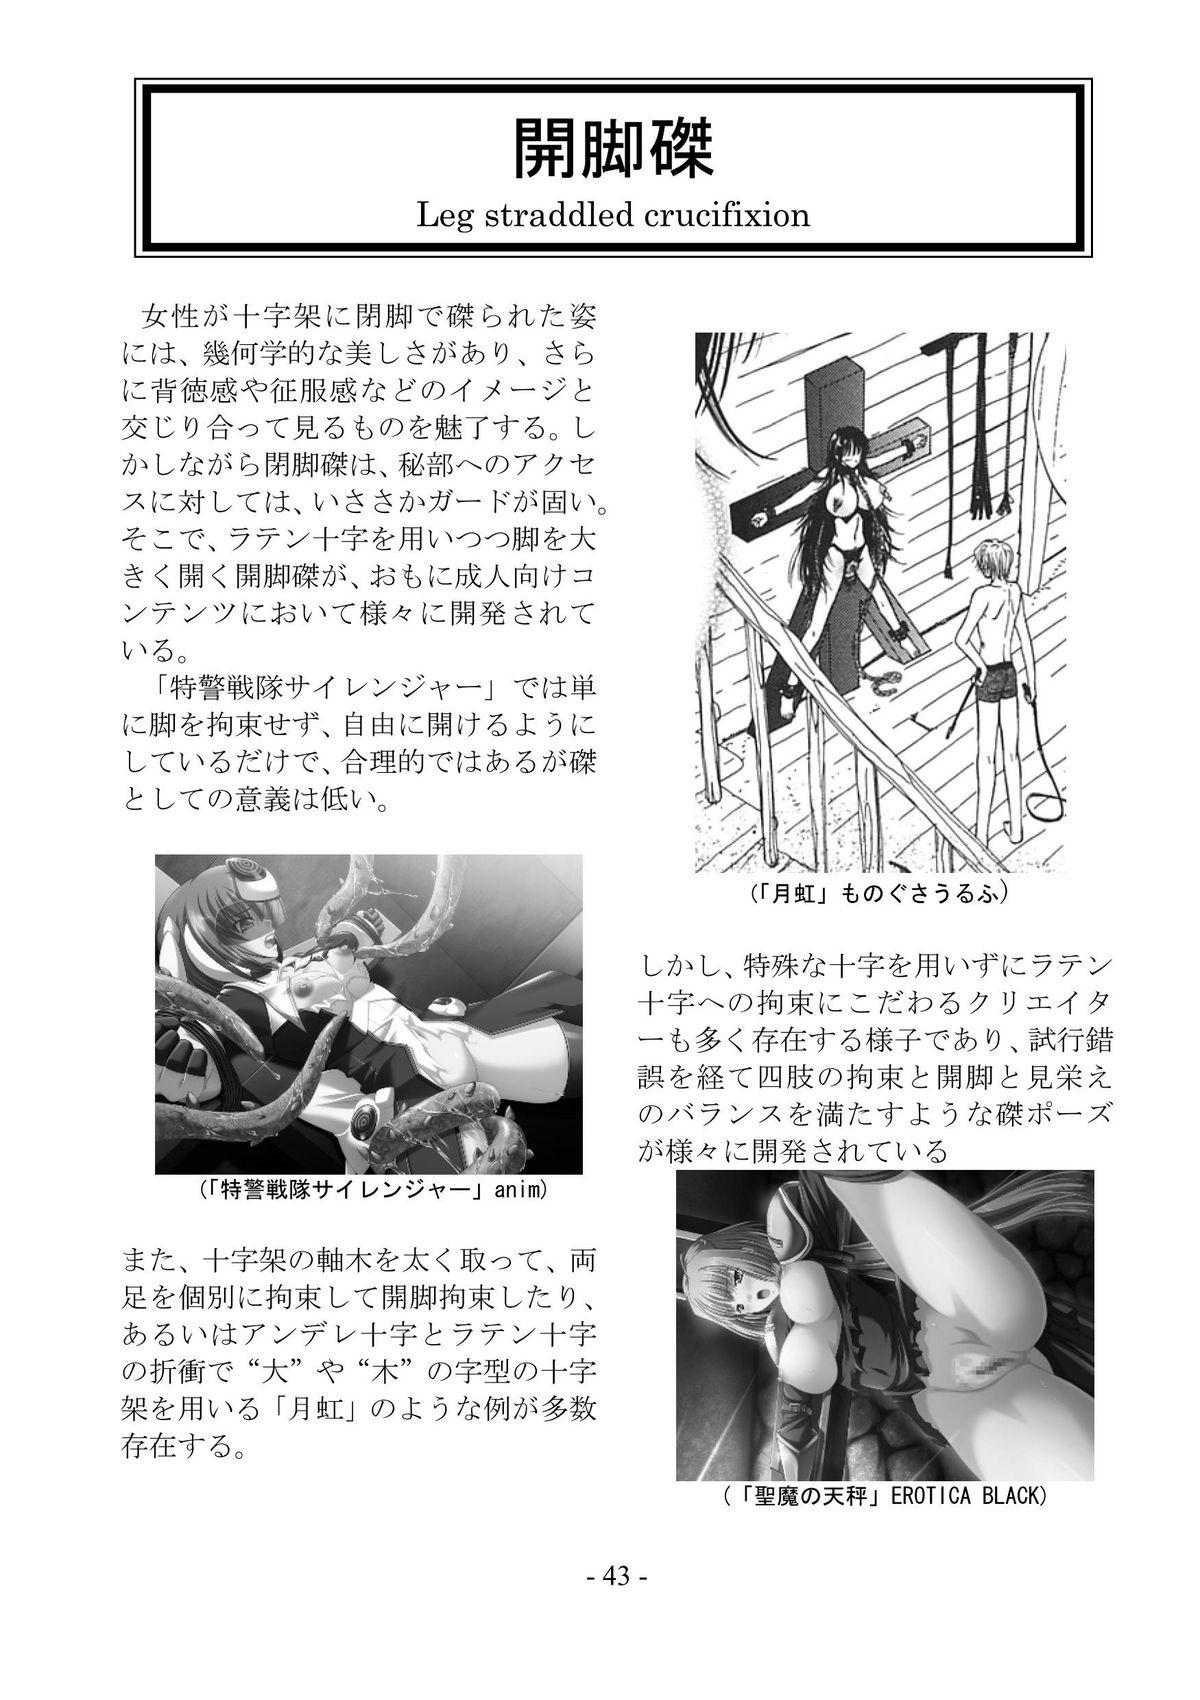 encyclopedia of crucifixion 43